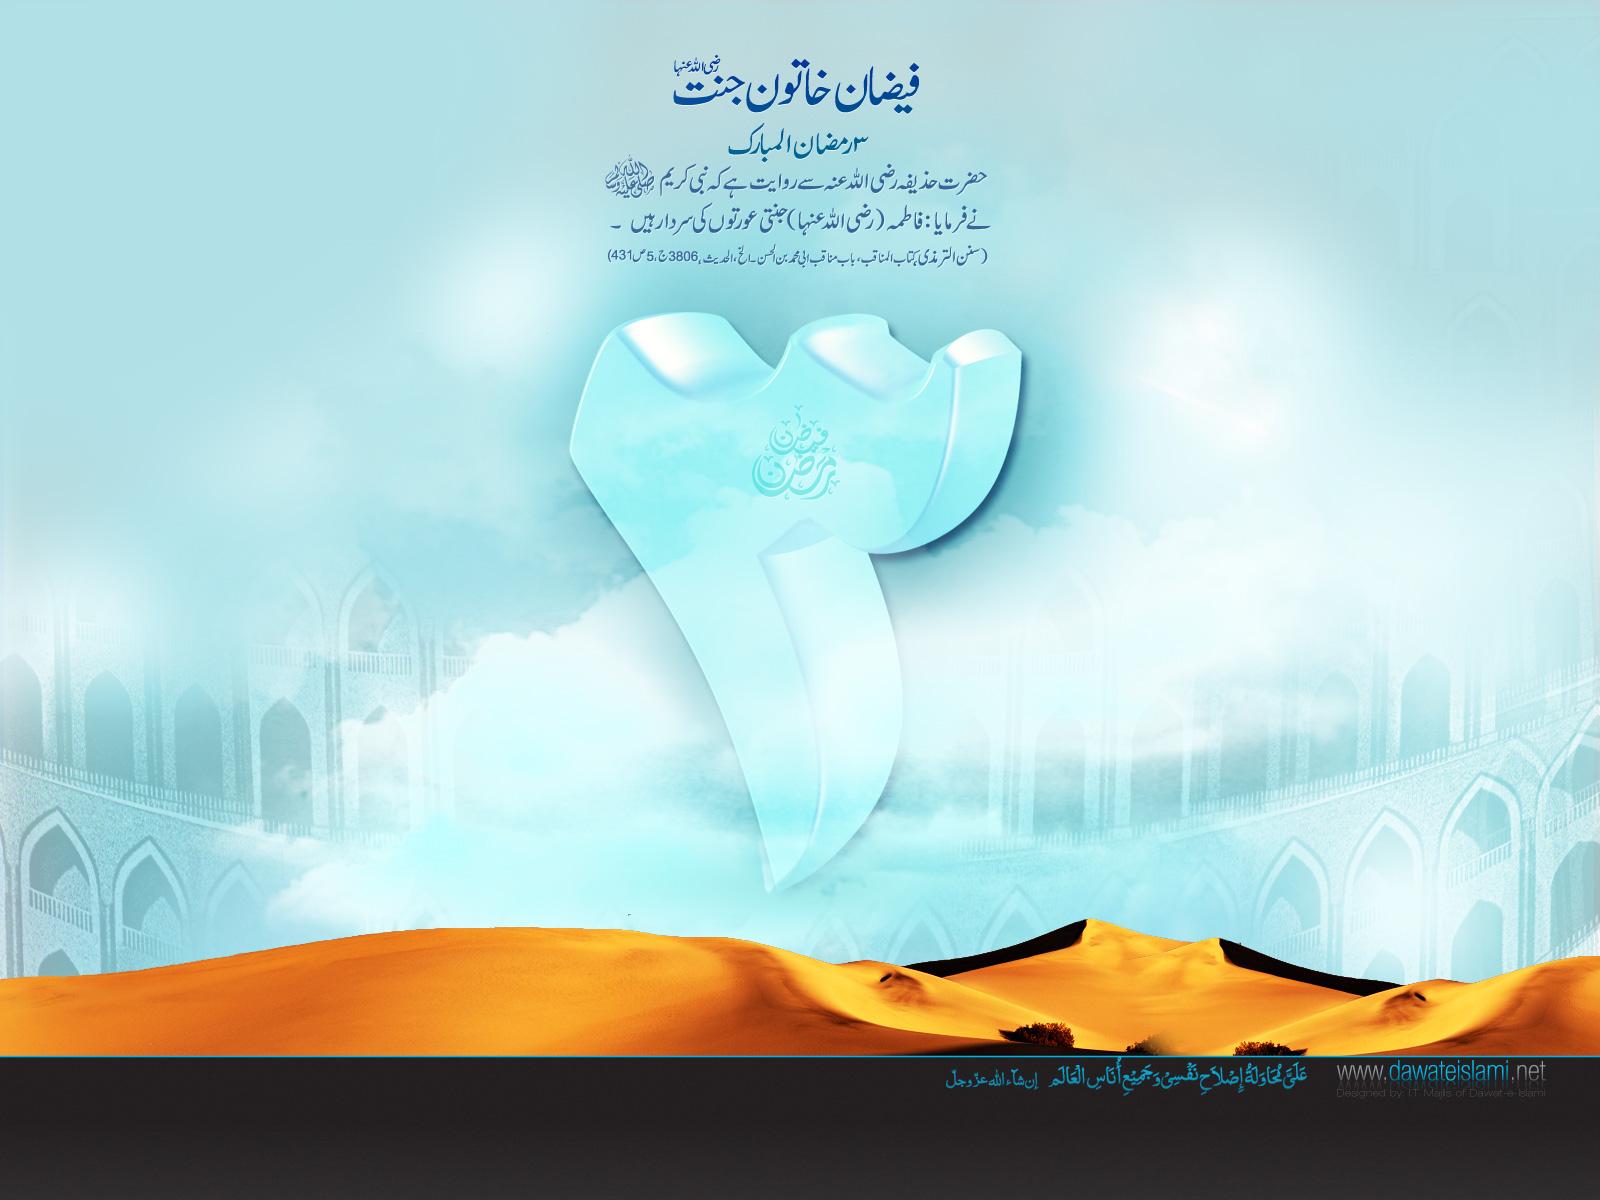 http://4.bp.blogspot.com/-WooniNeQUVg/T_ykdUxNF1I/AAAAAAAAATY/kkLPJZW1zqs/s1600/ramadan+kareem_wallpapers_by_dawateislami_11.jpg